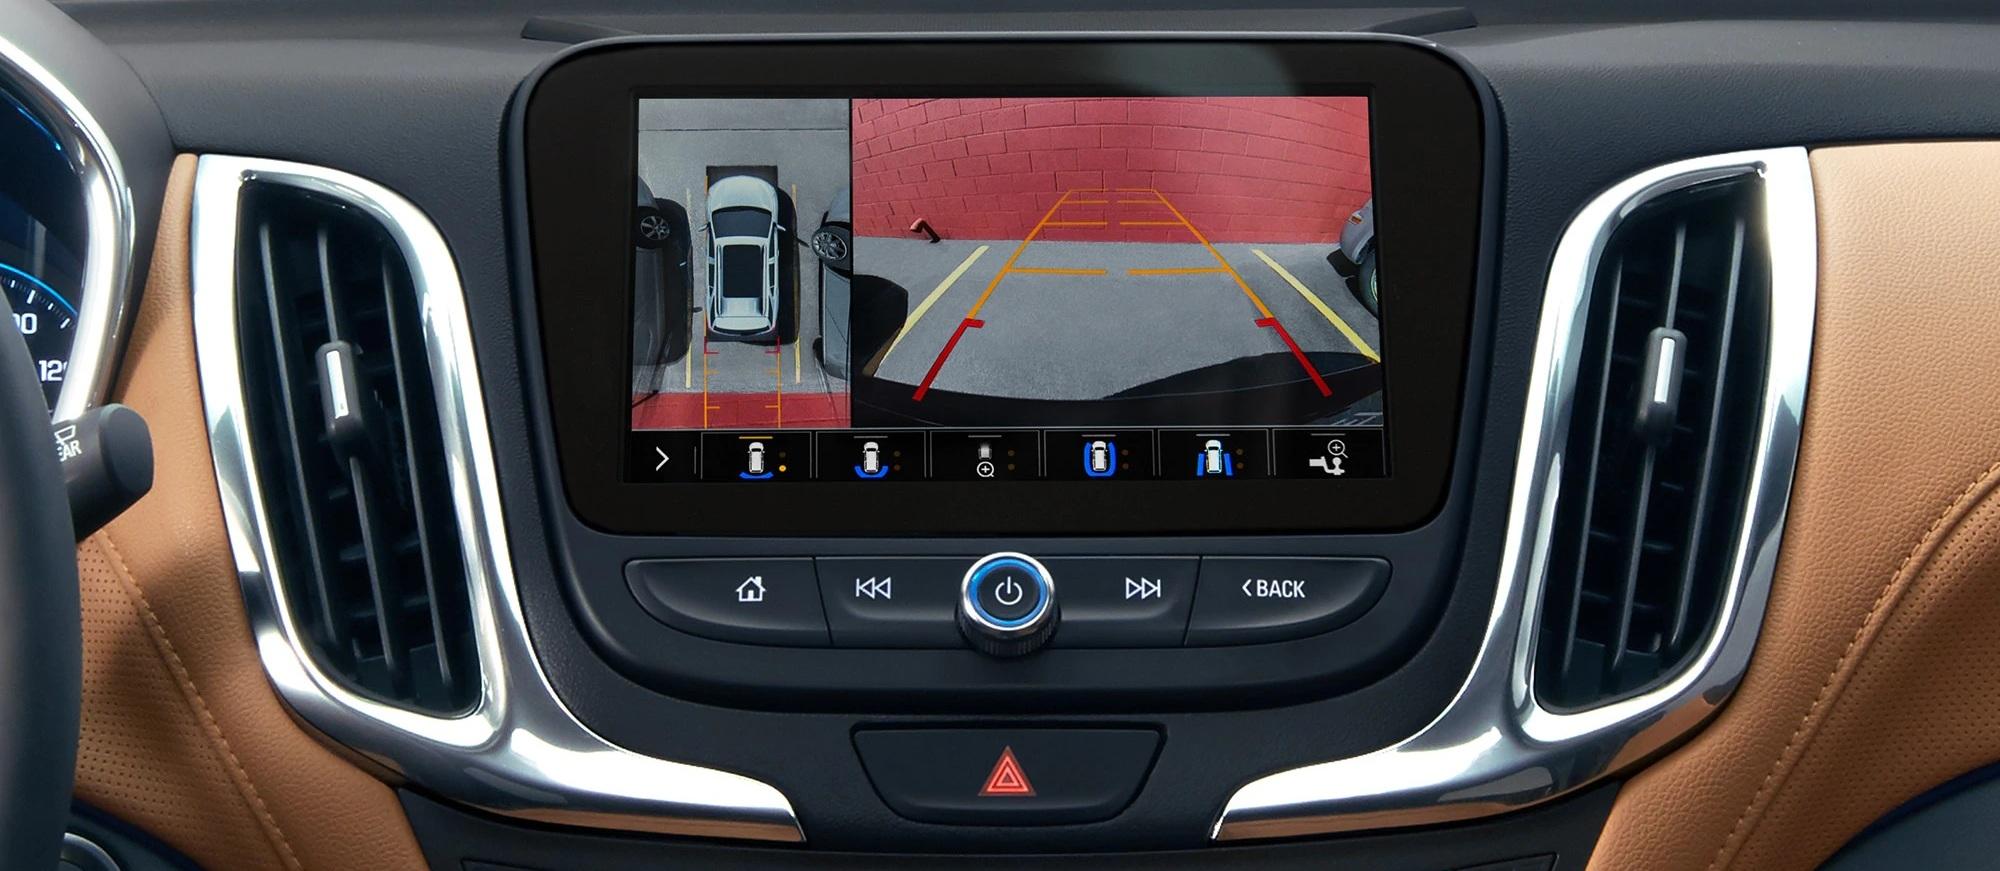 2020 Chevrolet Equinox Rearview Camera